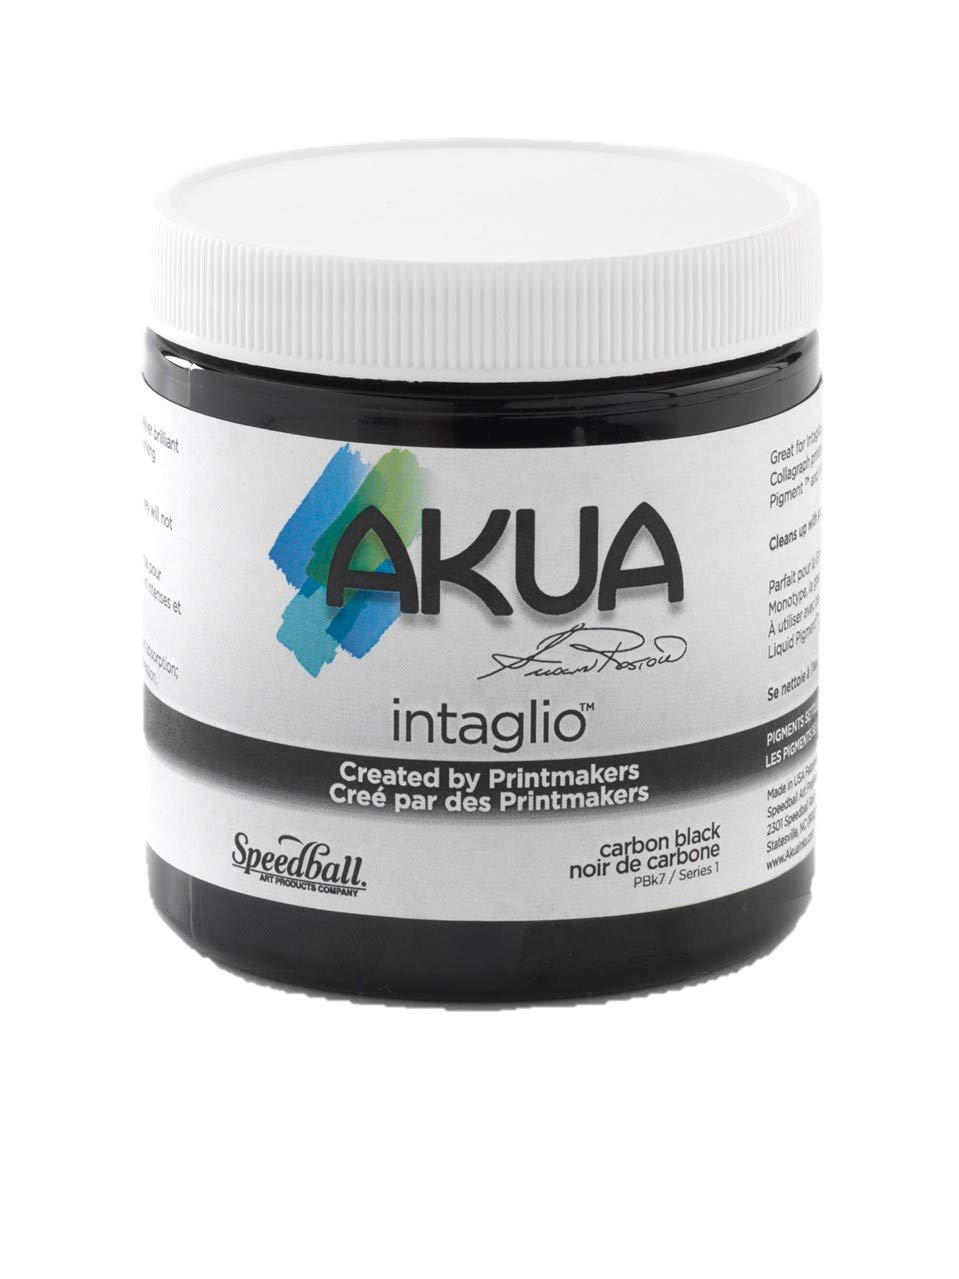 Akua Intaglio Ink, 8 oz, Carbon Black